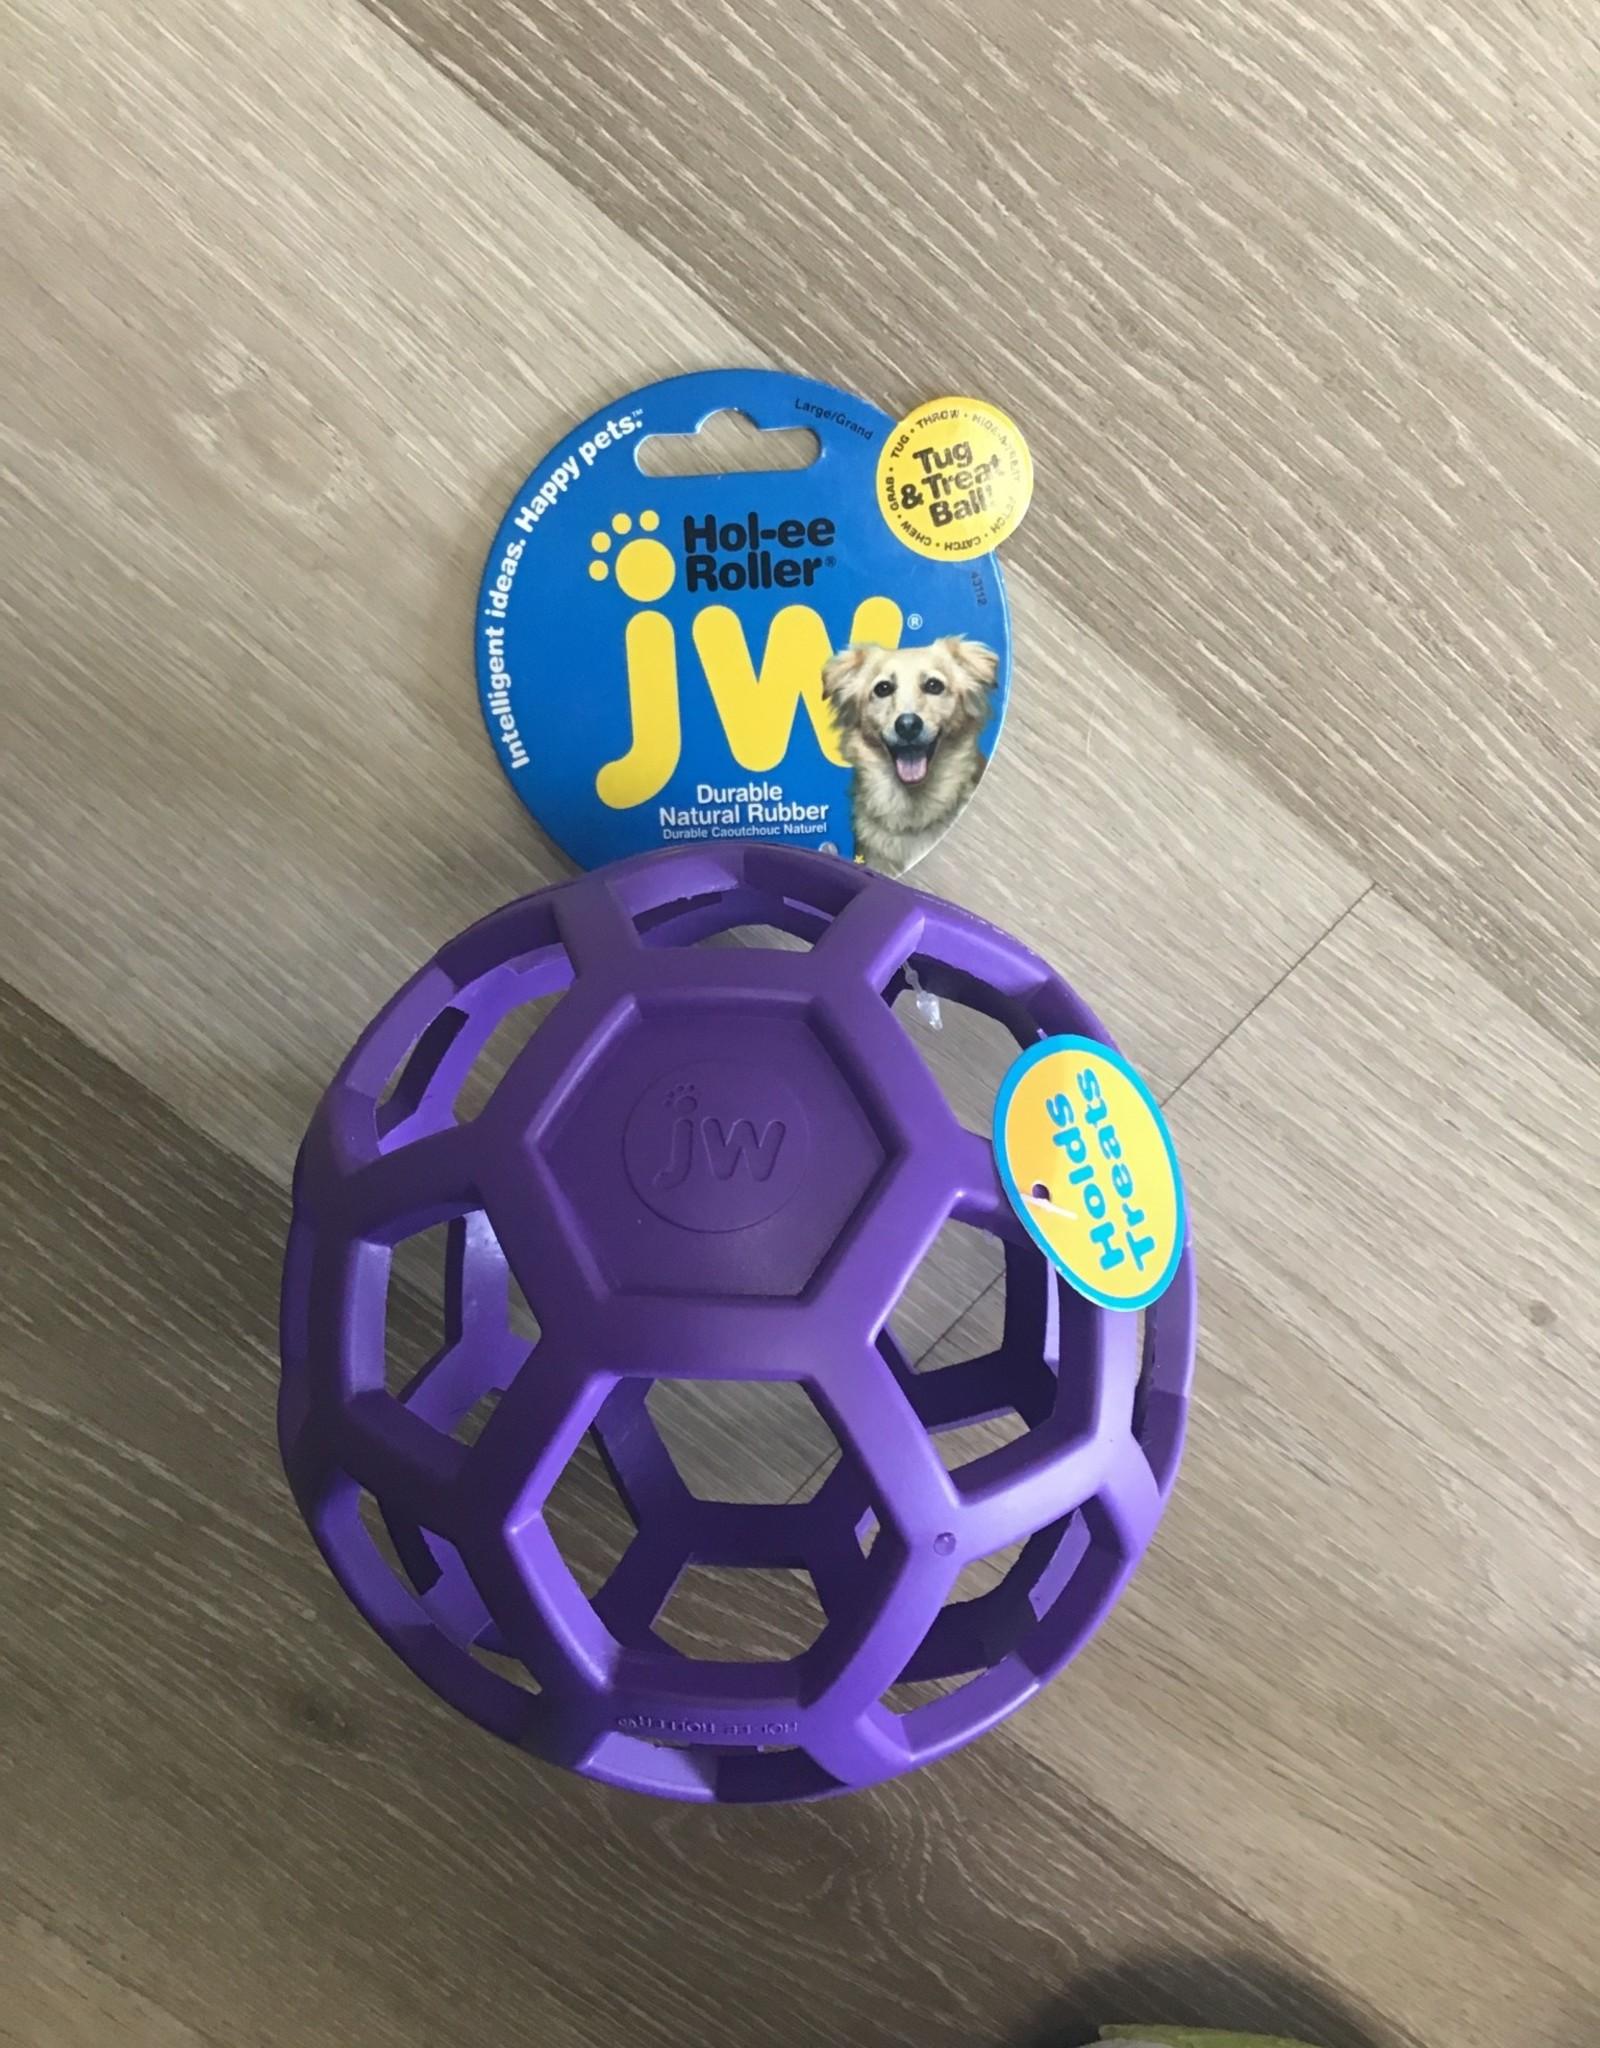 JW Roller Large Toy